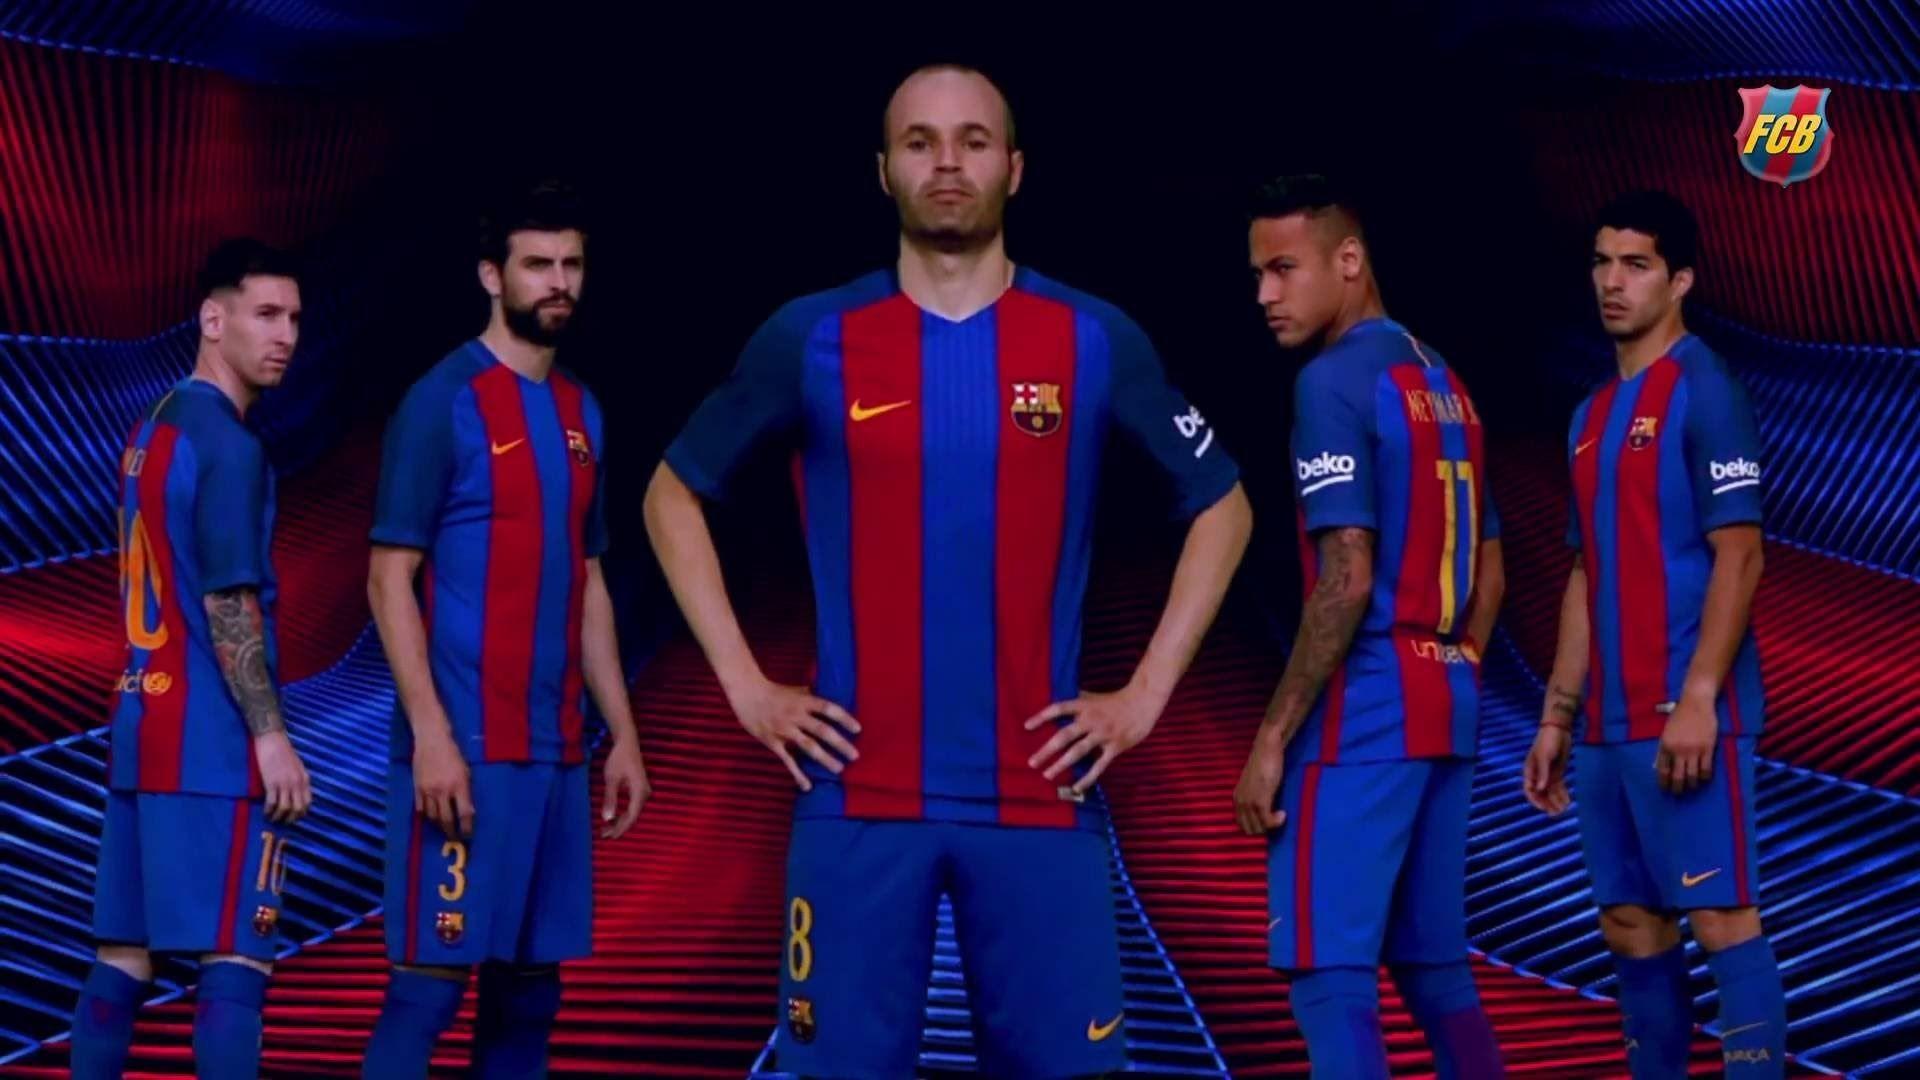 … FC Barcelona Wallpapers 2017 5 …